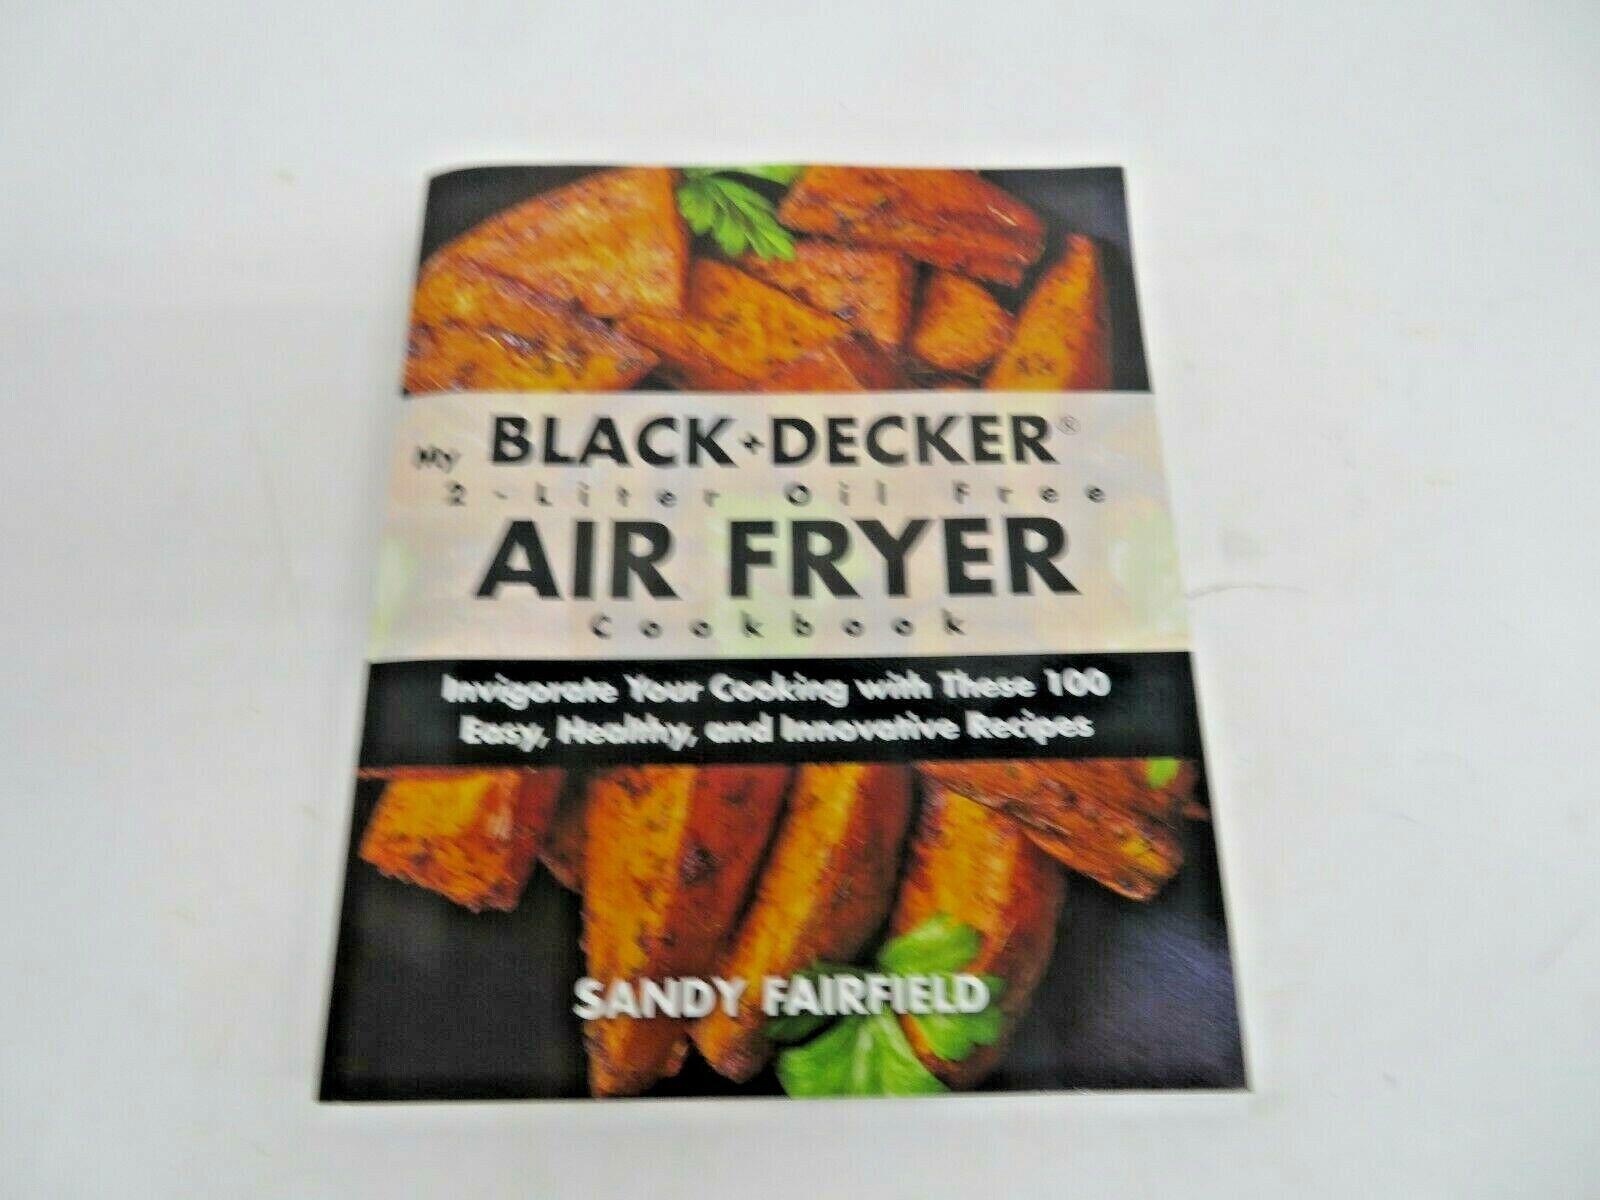 My Black+decker 2-Liter Oil Free Air Fryer Cookbook: Invigor